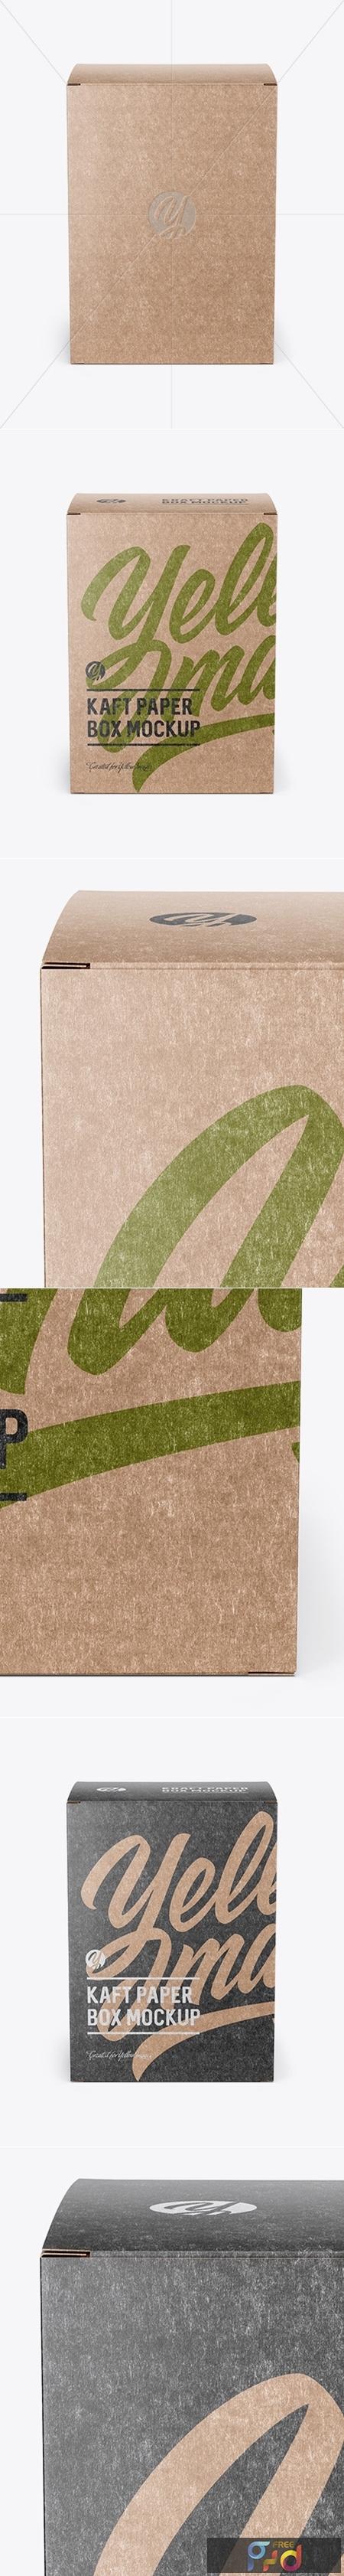 Kraft Paper Box Mockup - Front View 50496 1